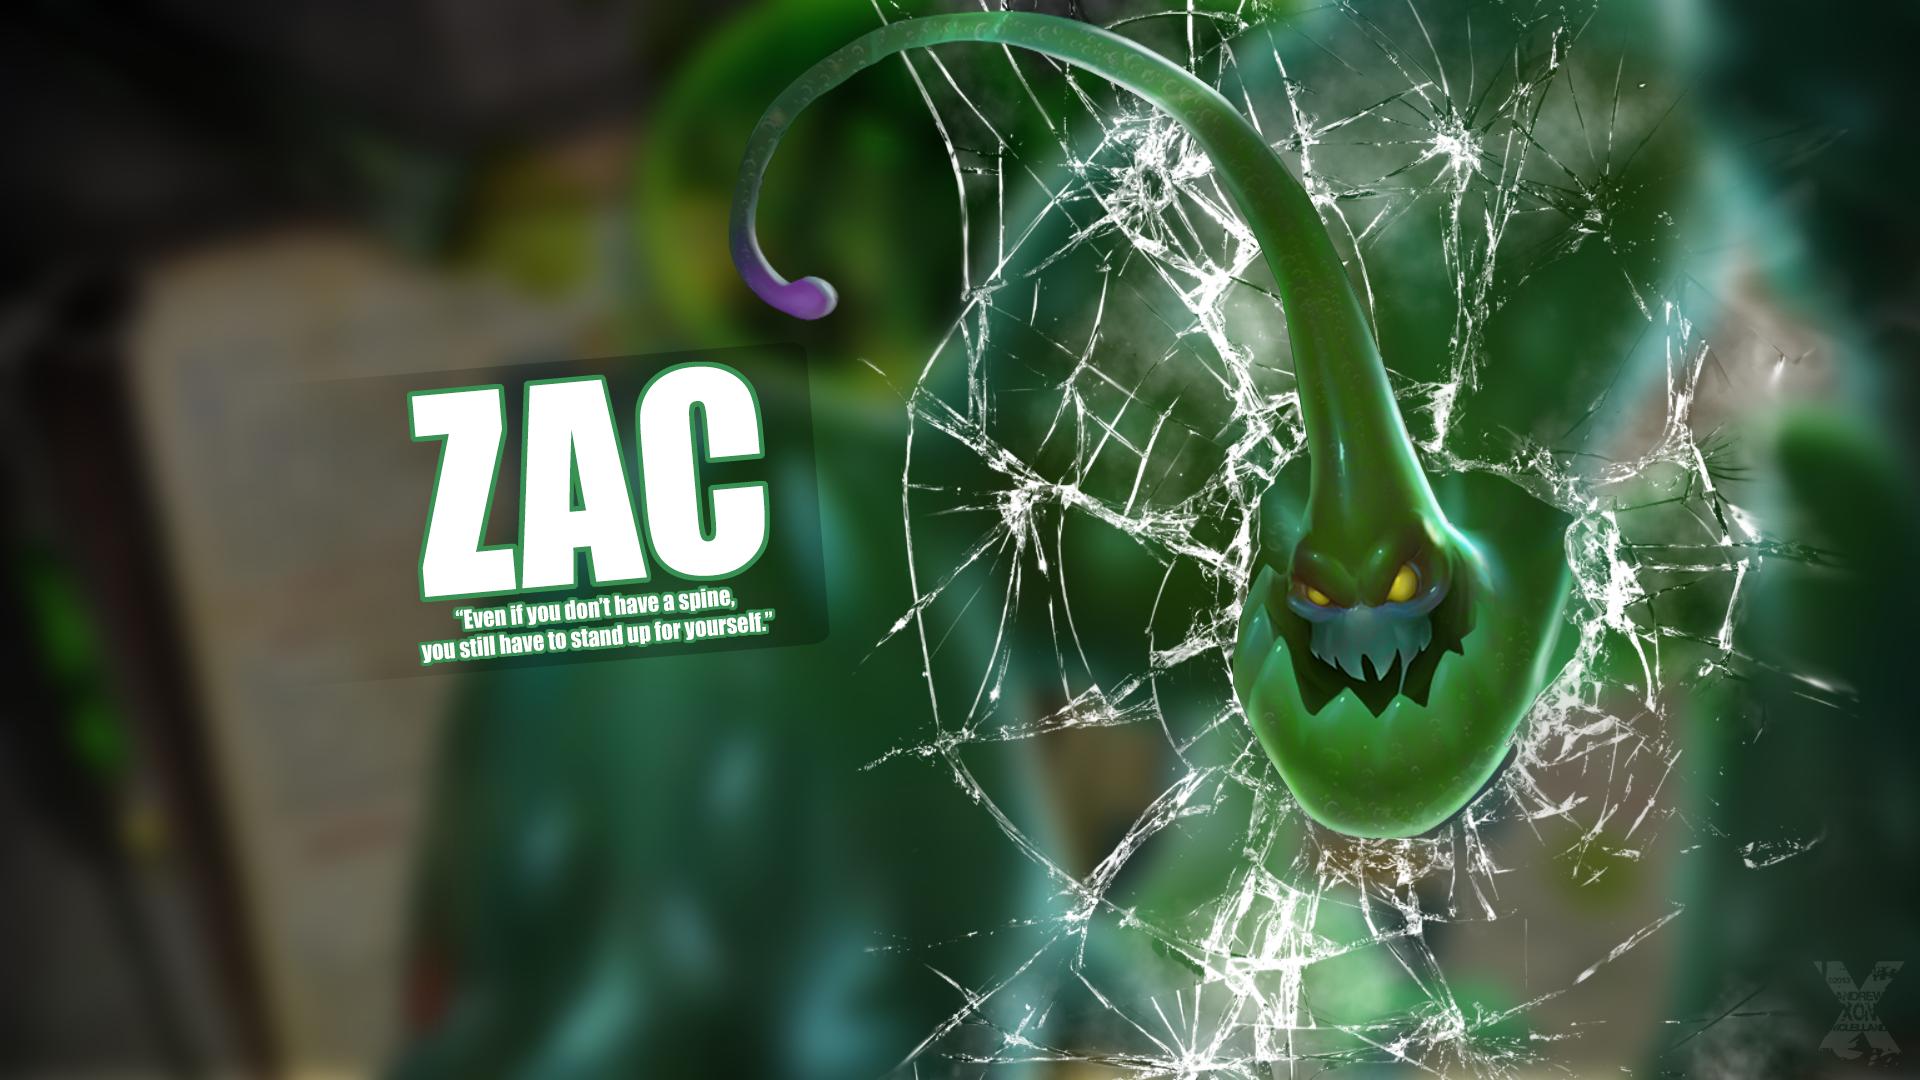 Zac wallpaper